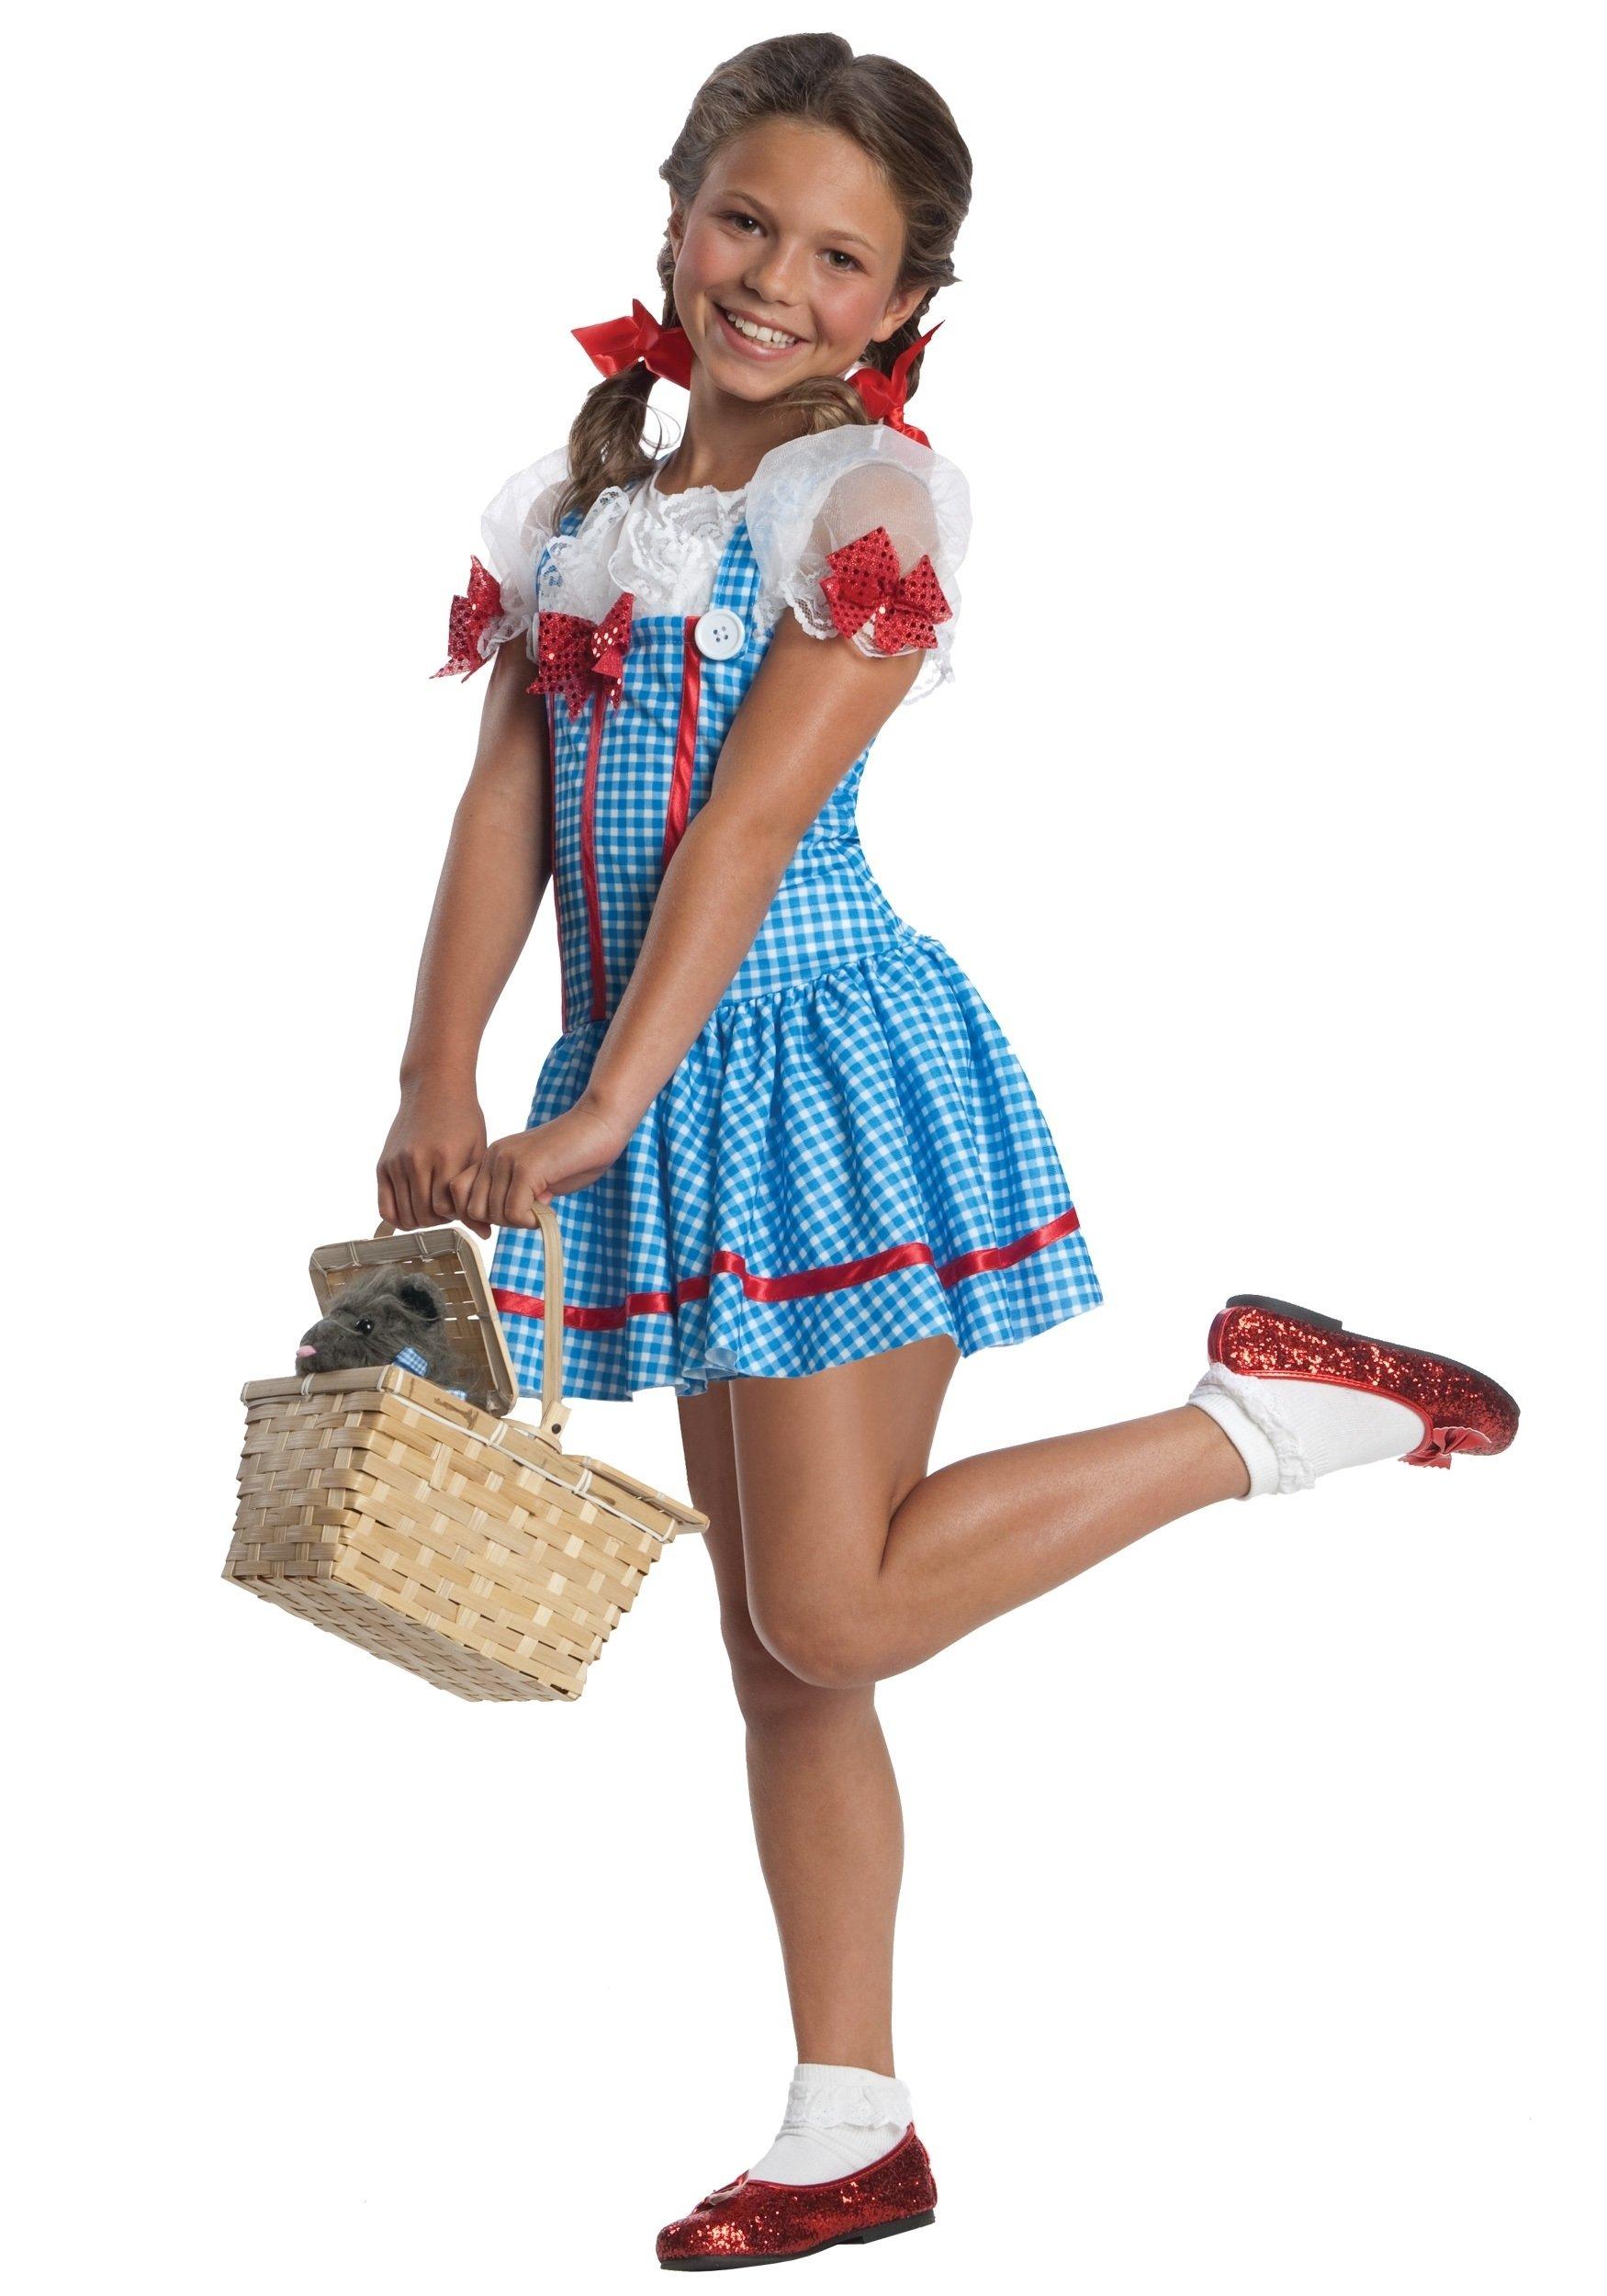 10 Fashionable Little Girl Halloween Costume Ideas girls dorothy costume 2020